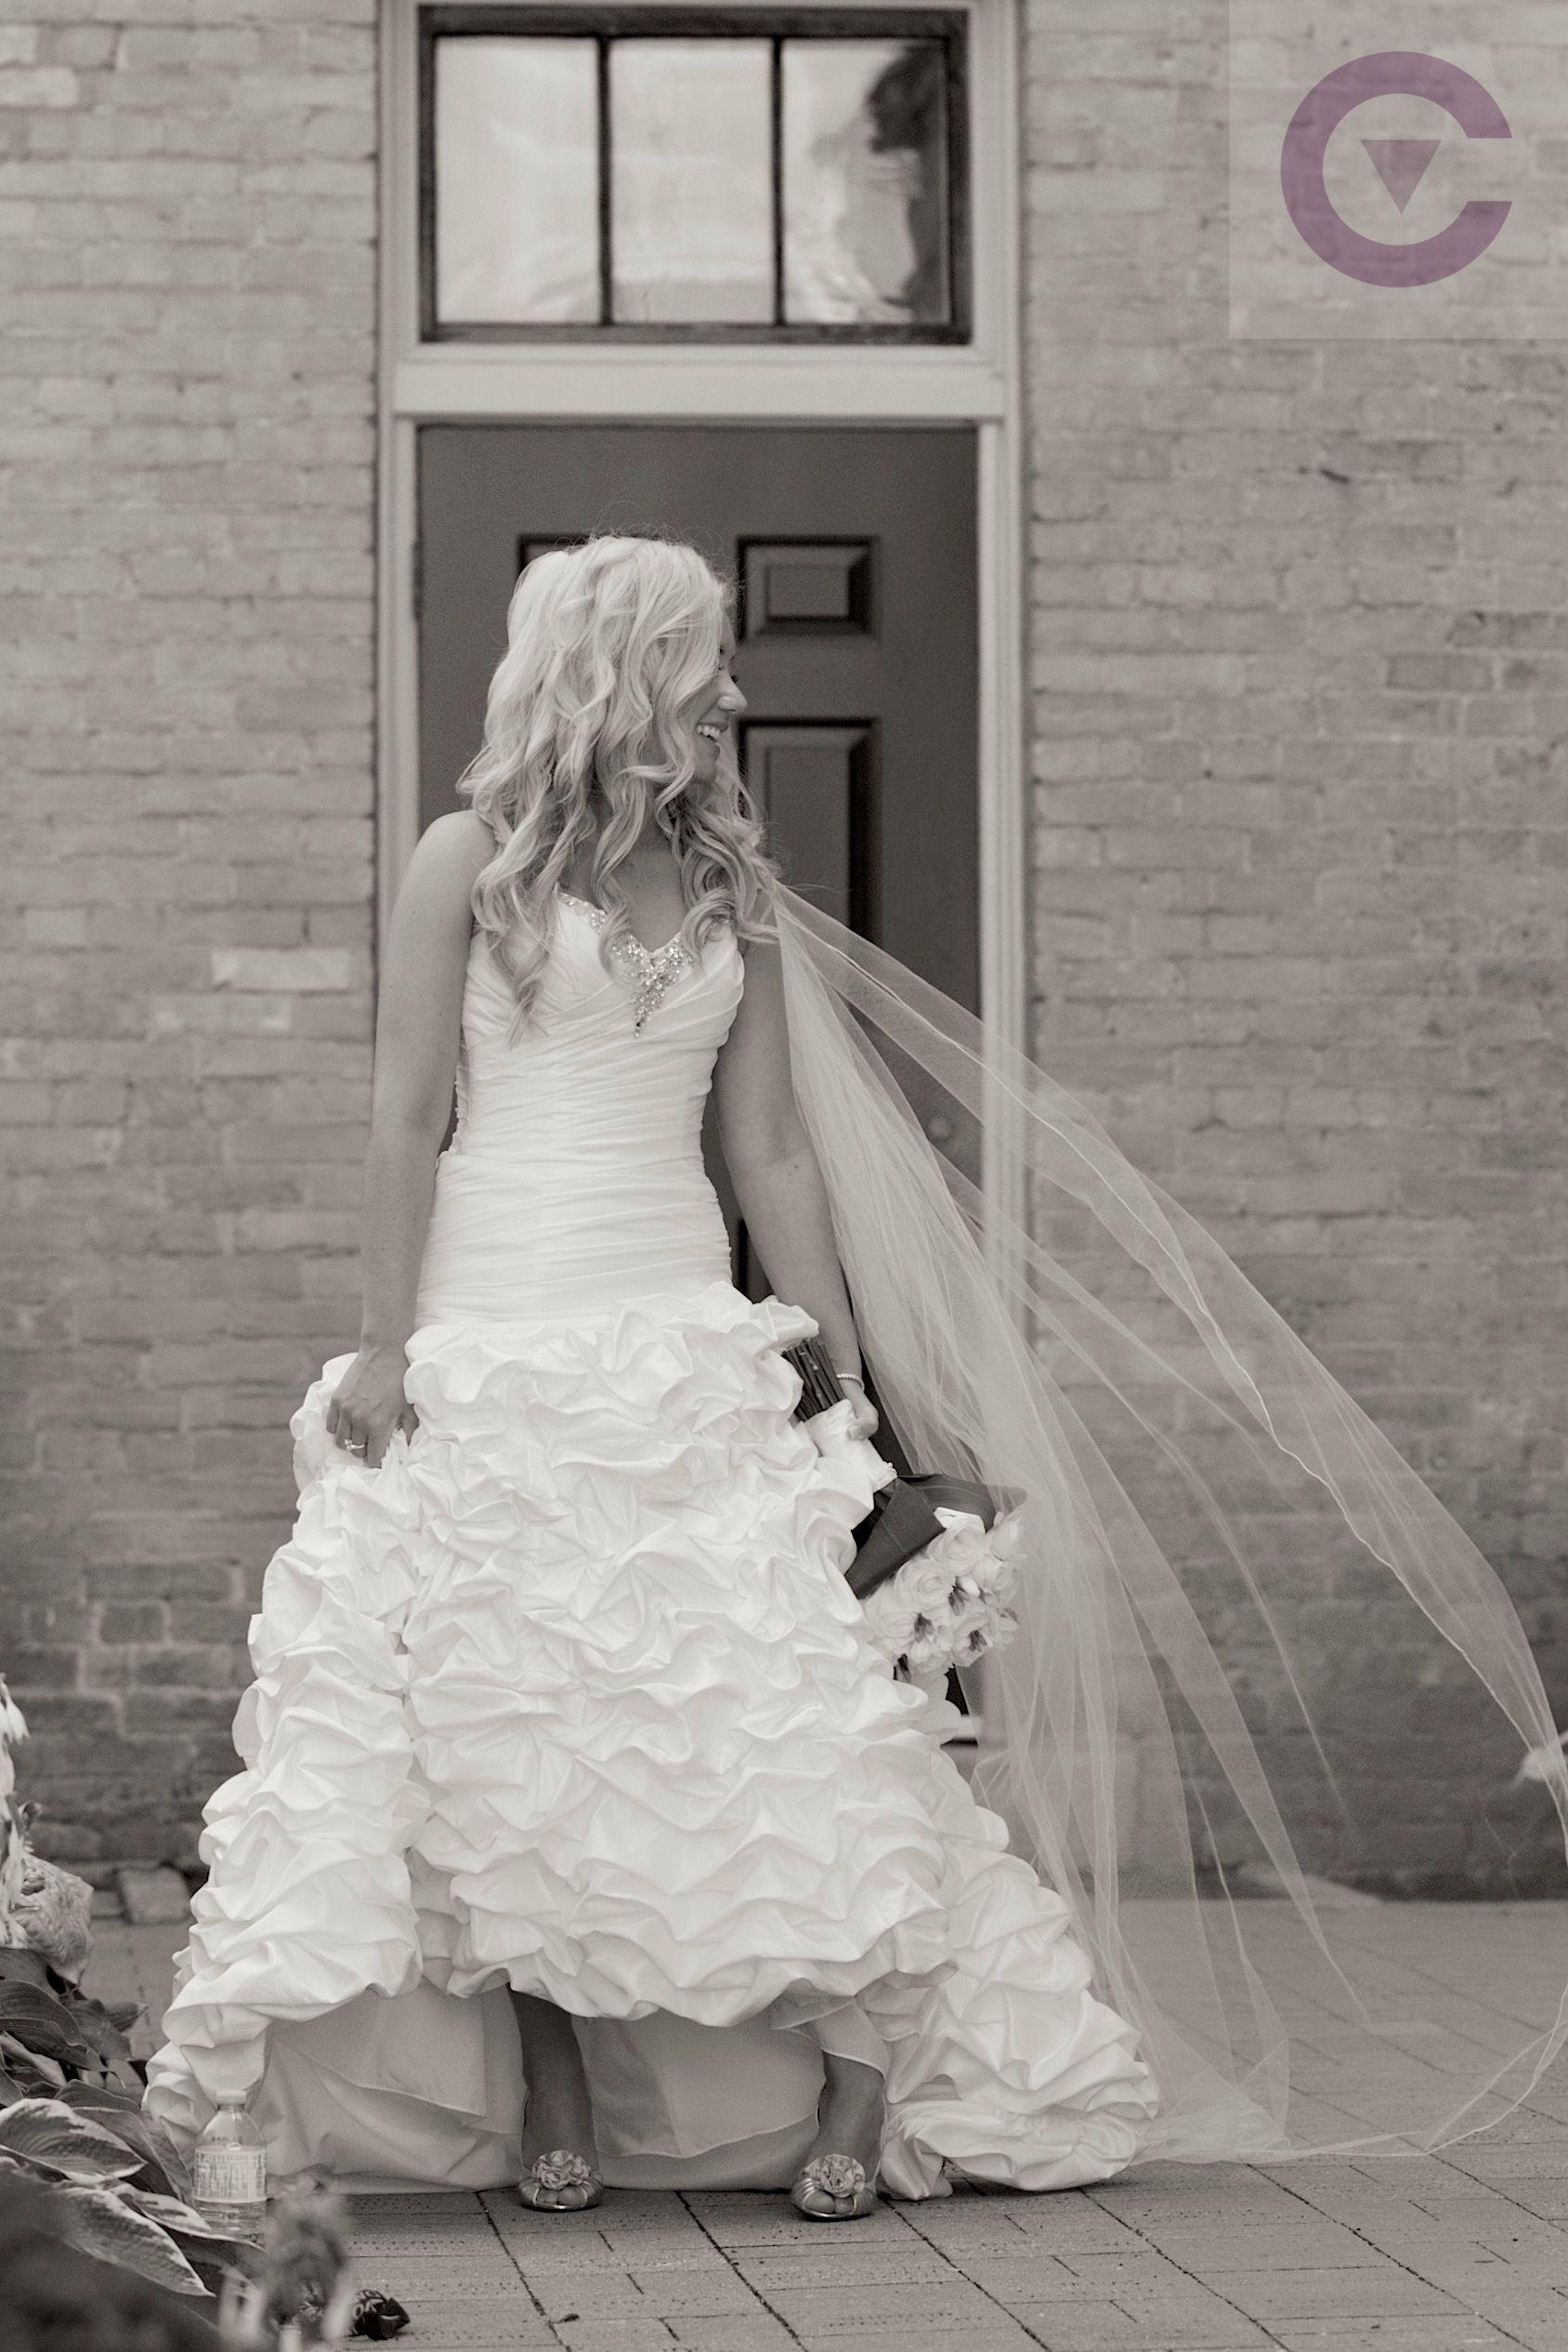 Wedding veil blowing in the wind wedding ideas pinterest veil